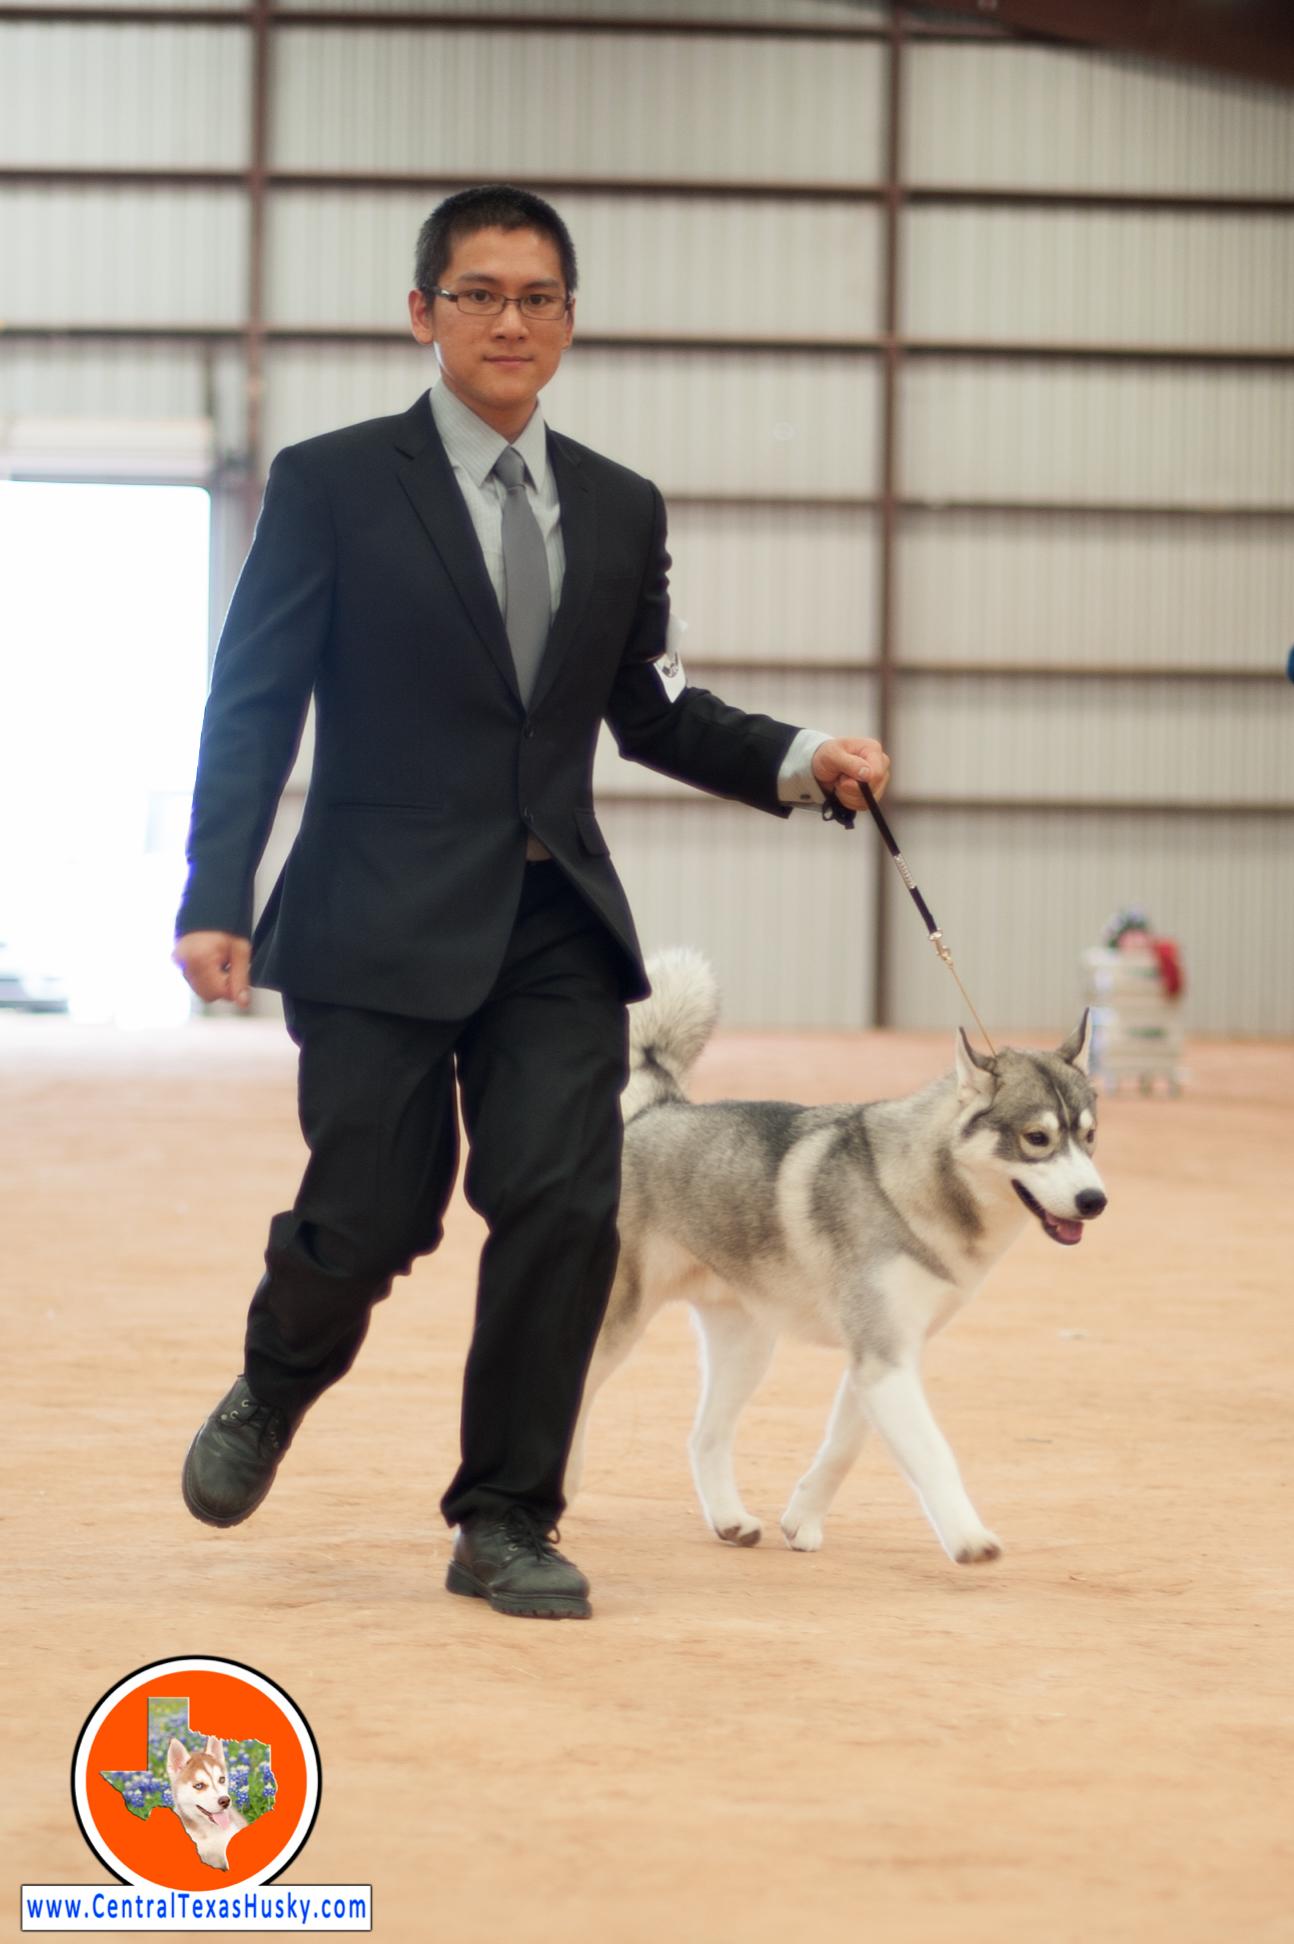 central-texas-husky_austin-siberian-husky-breeder_700805_20170923